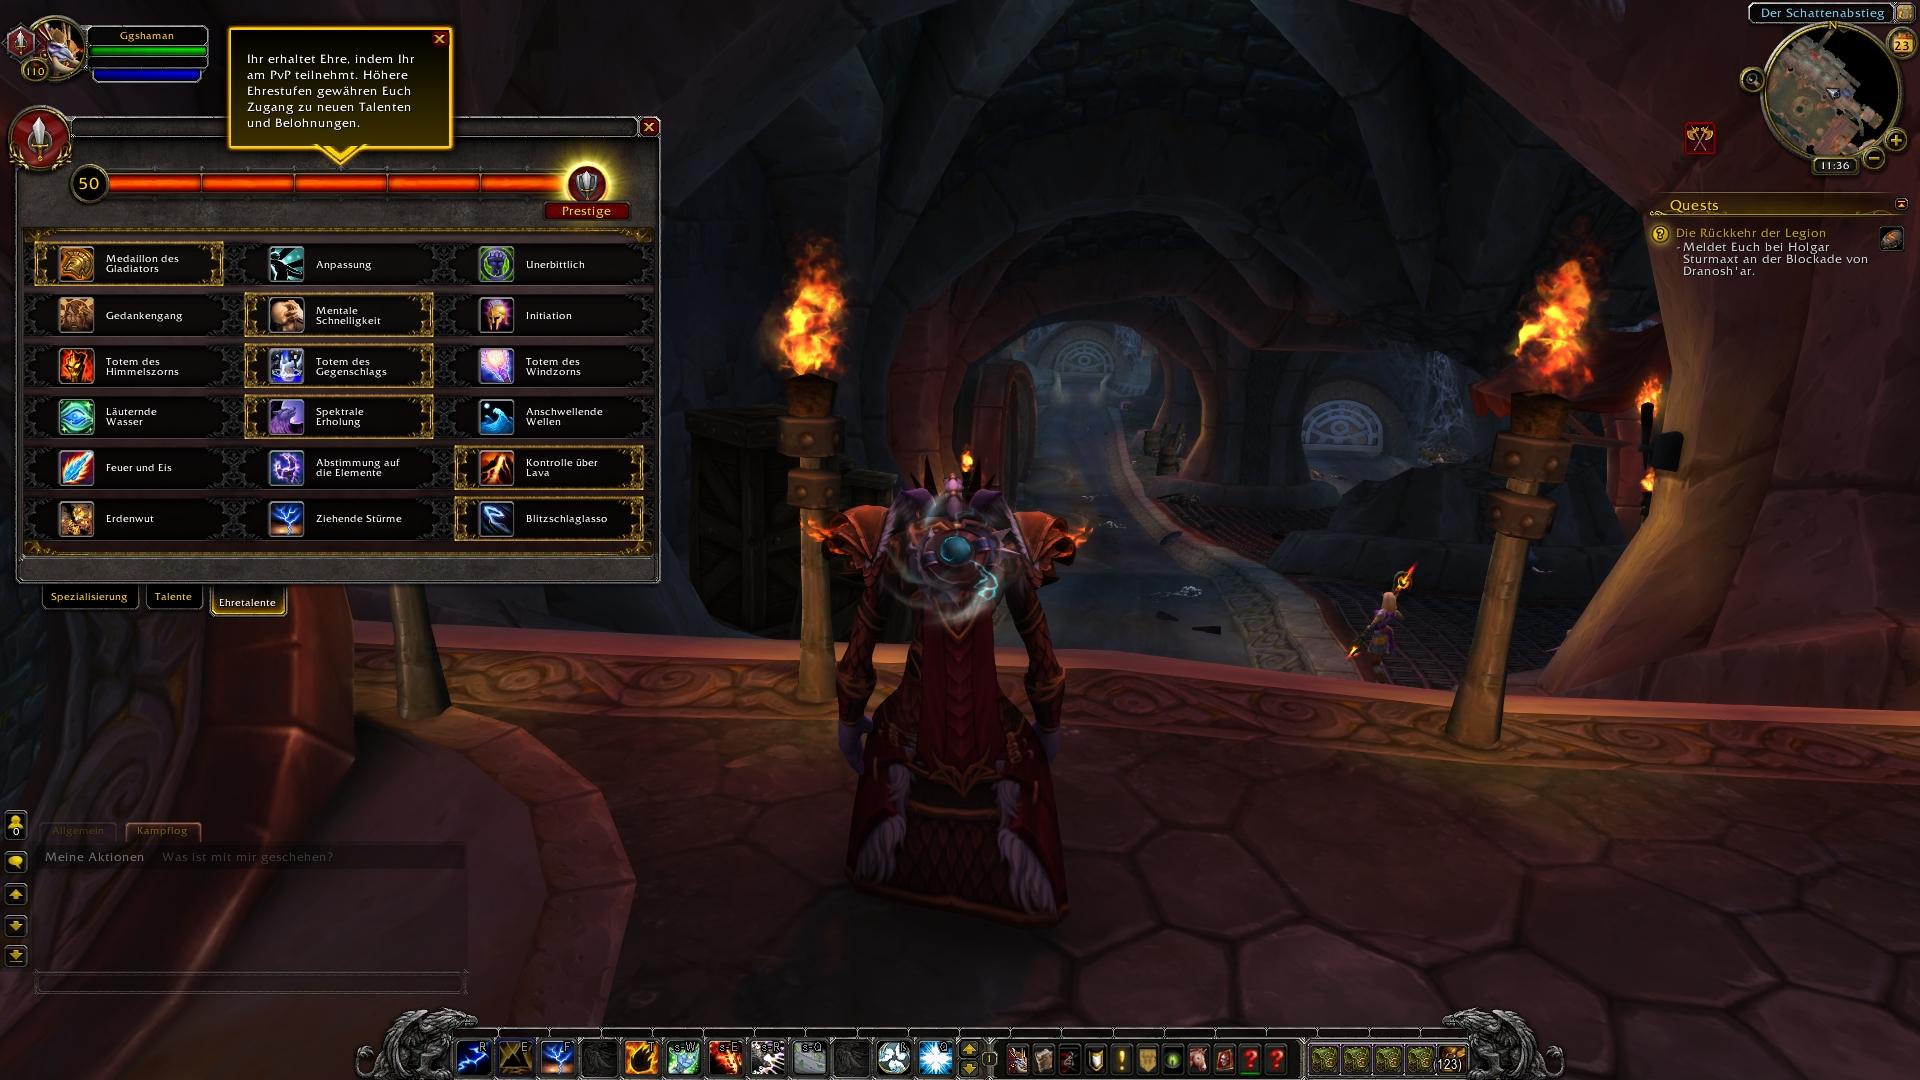 how to get prestige wow